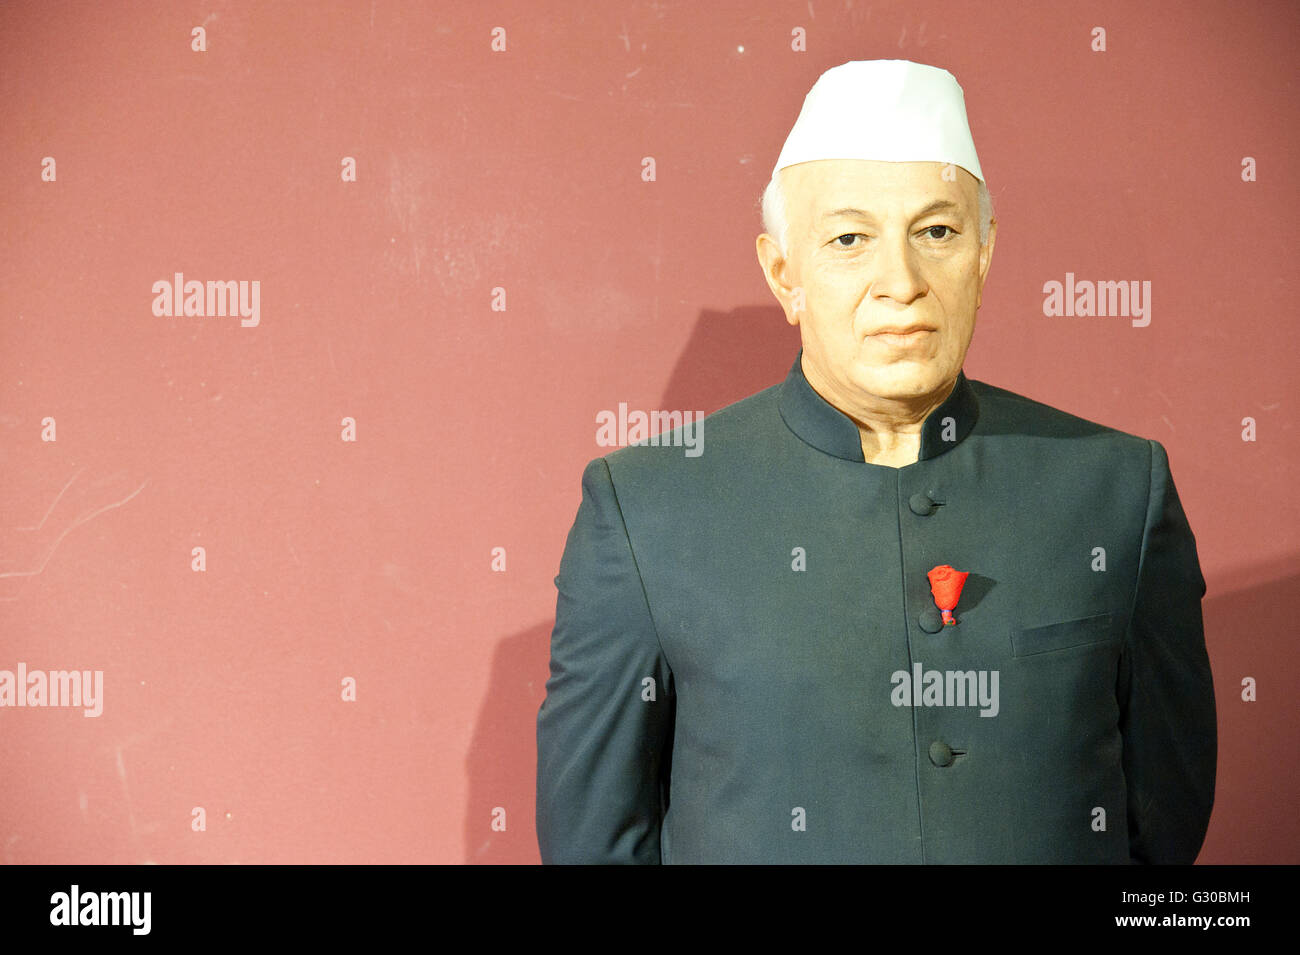 The image of Jawaharlal Nehru wax statue in Lonavala wax Museum, India - Stock Image